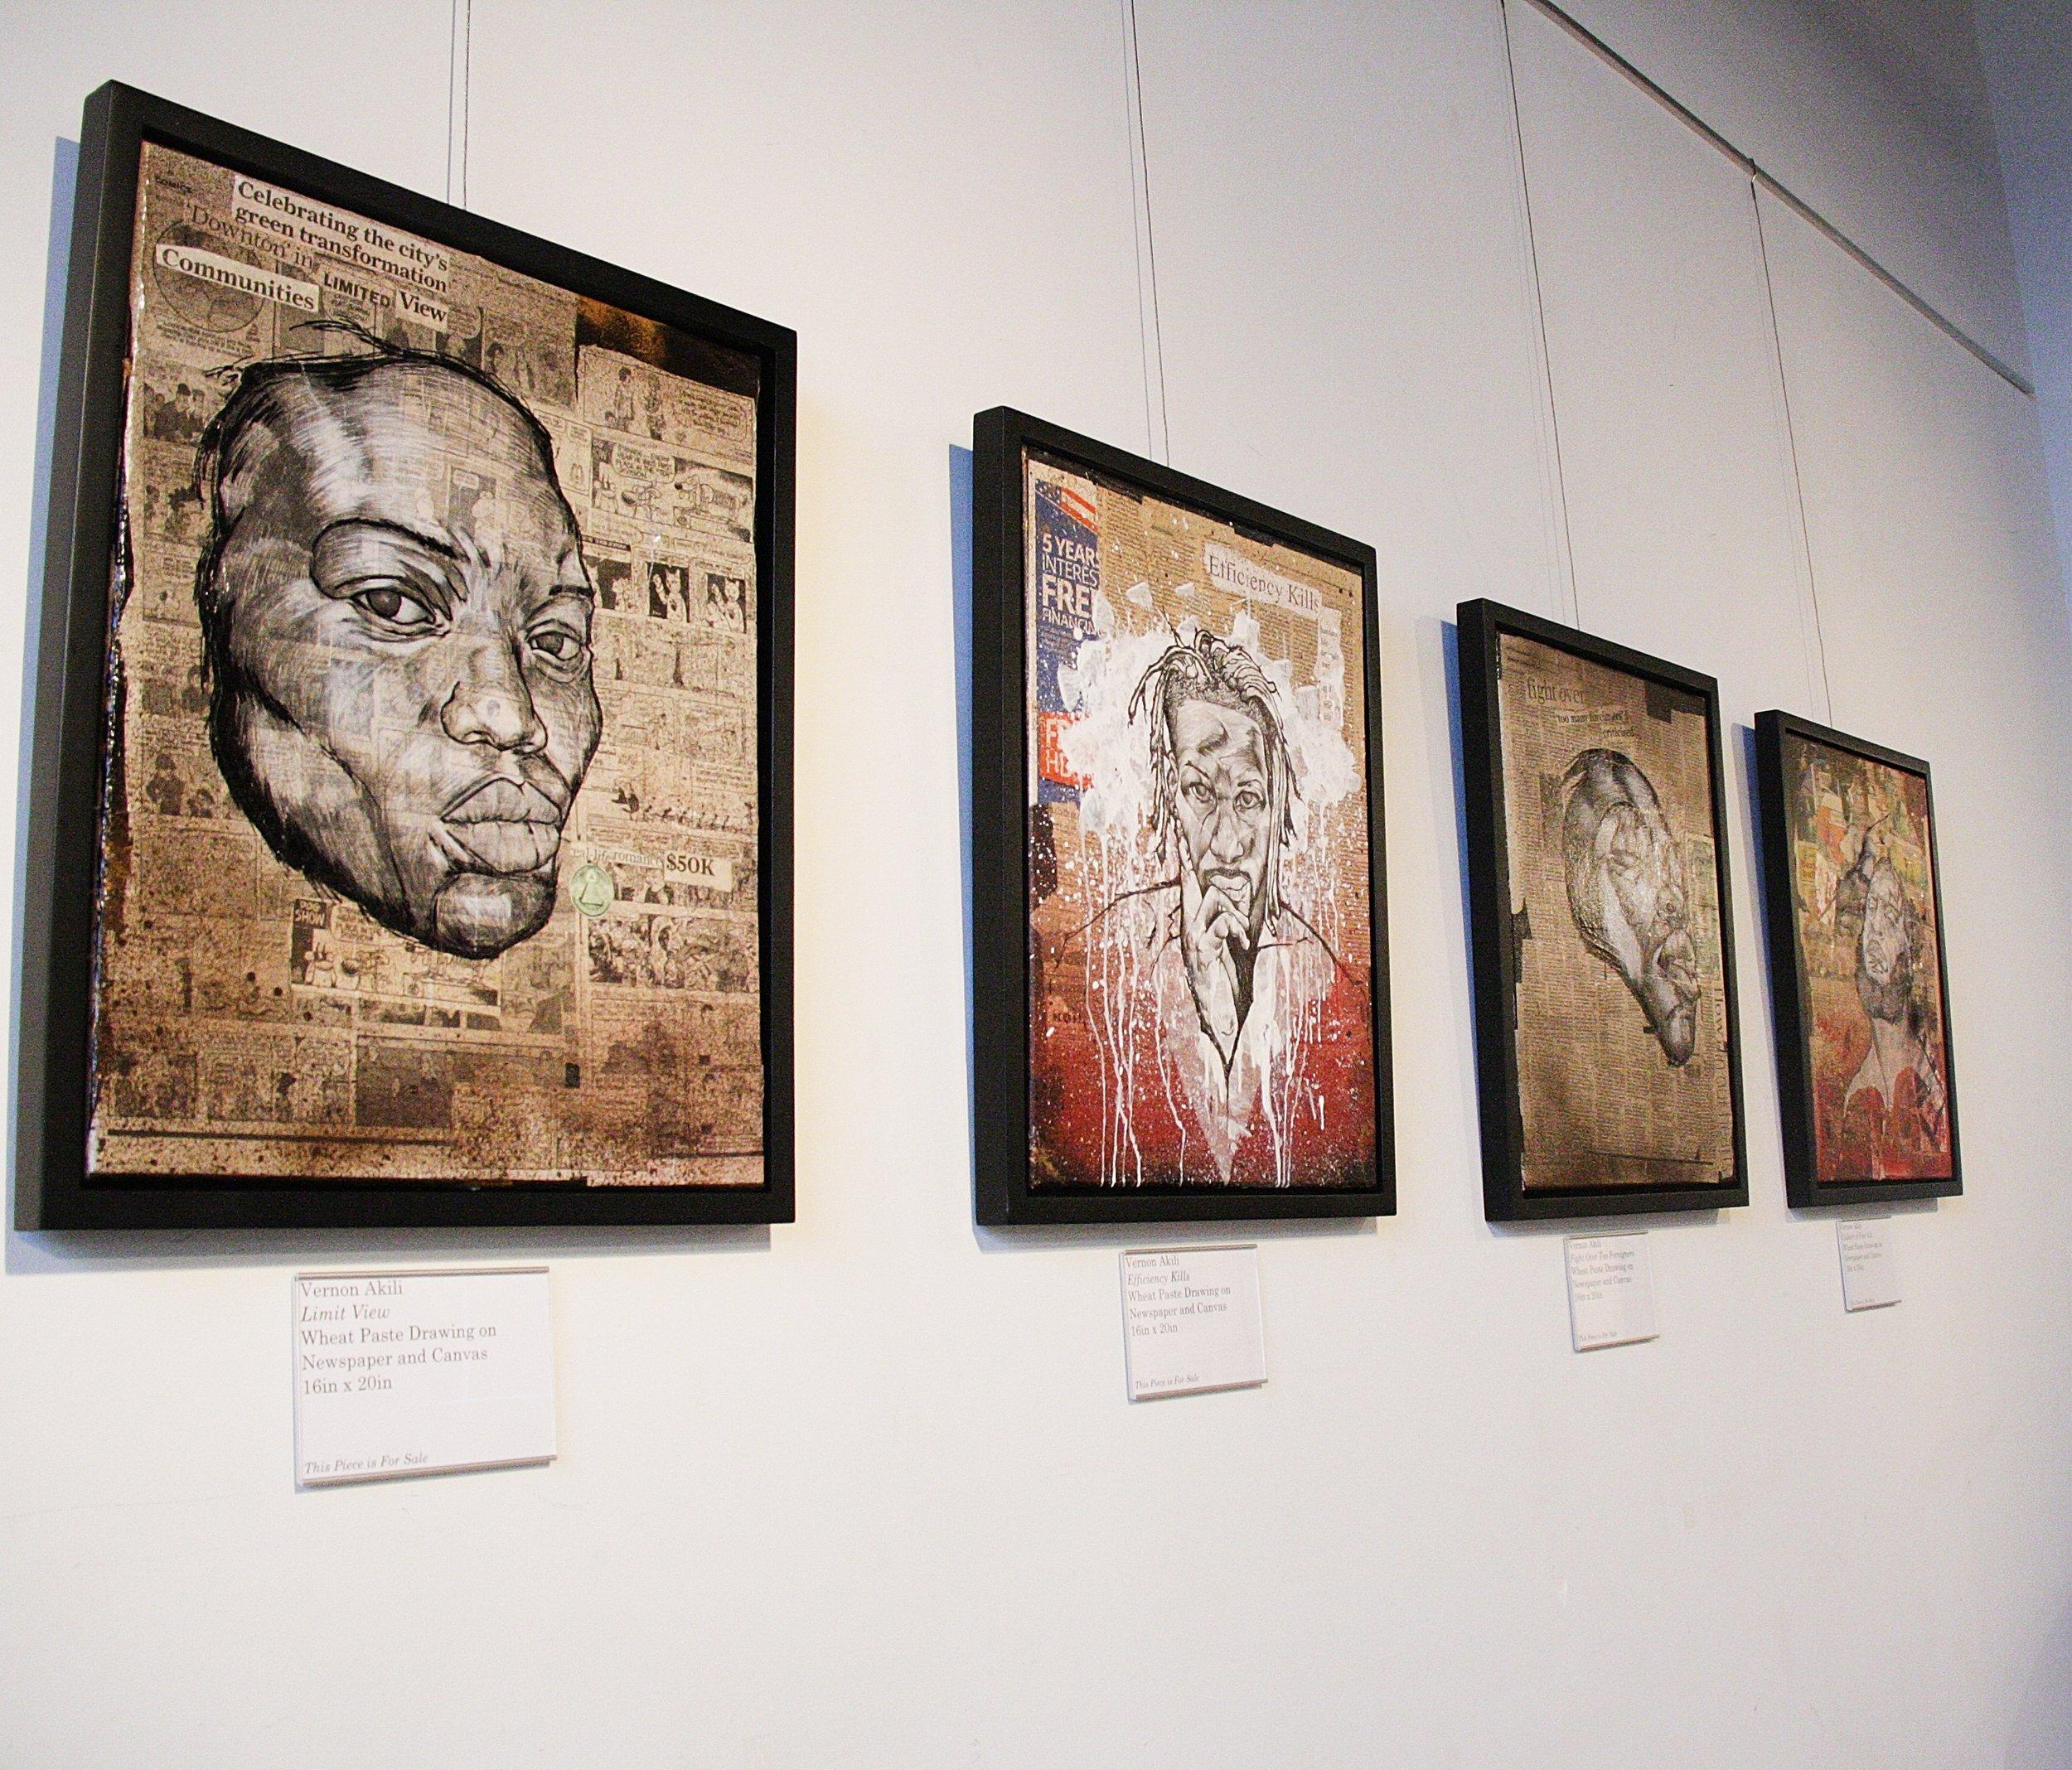 Vernon Akili art in situ3.jpg